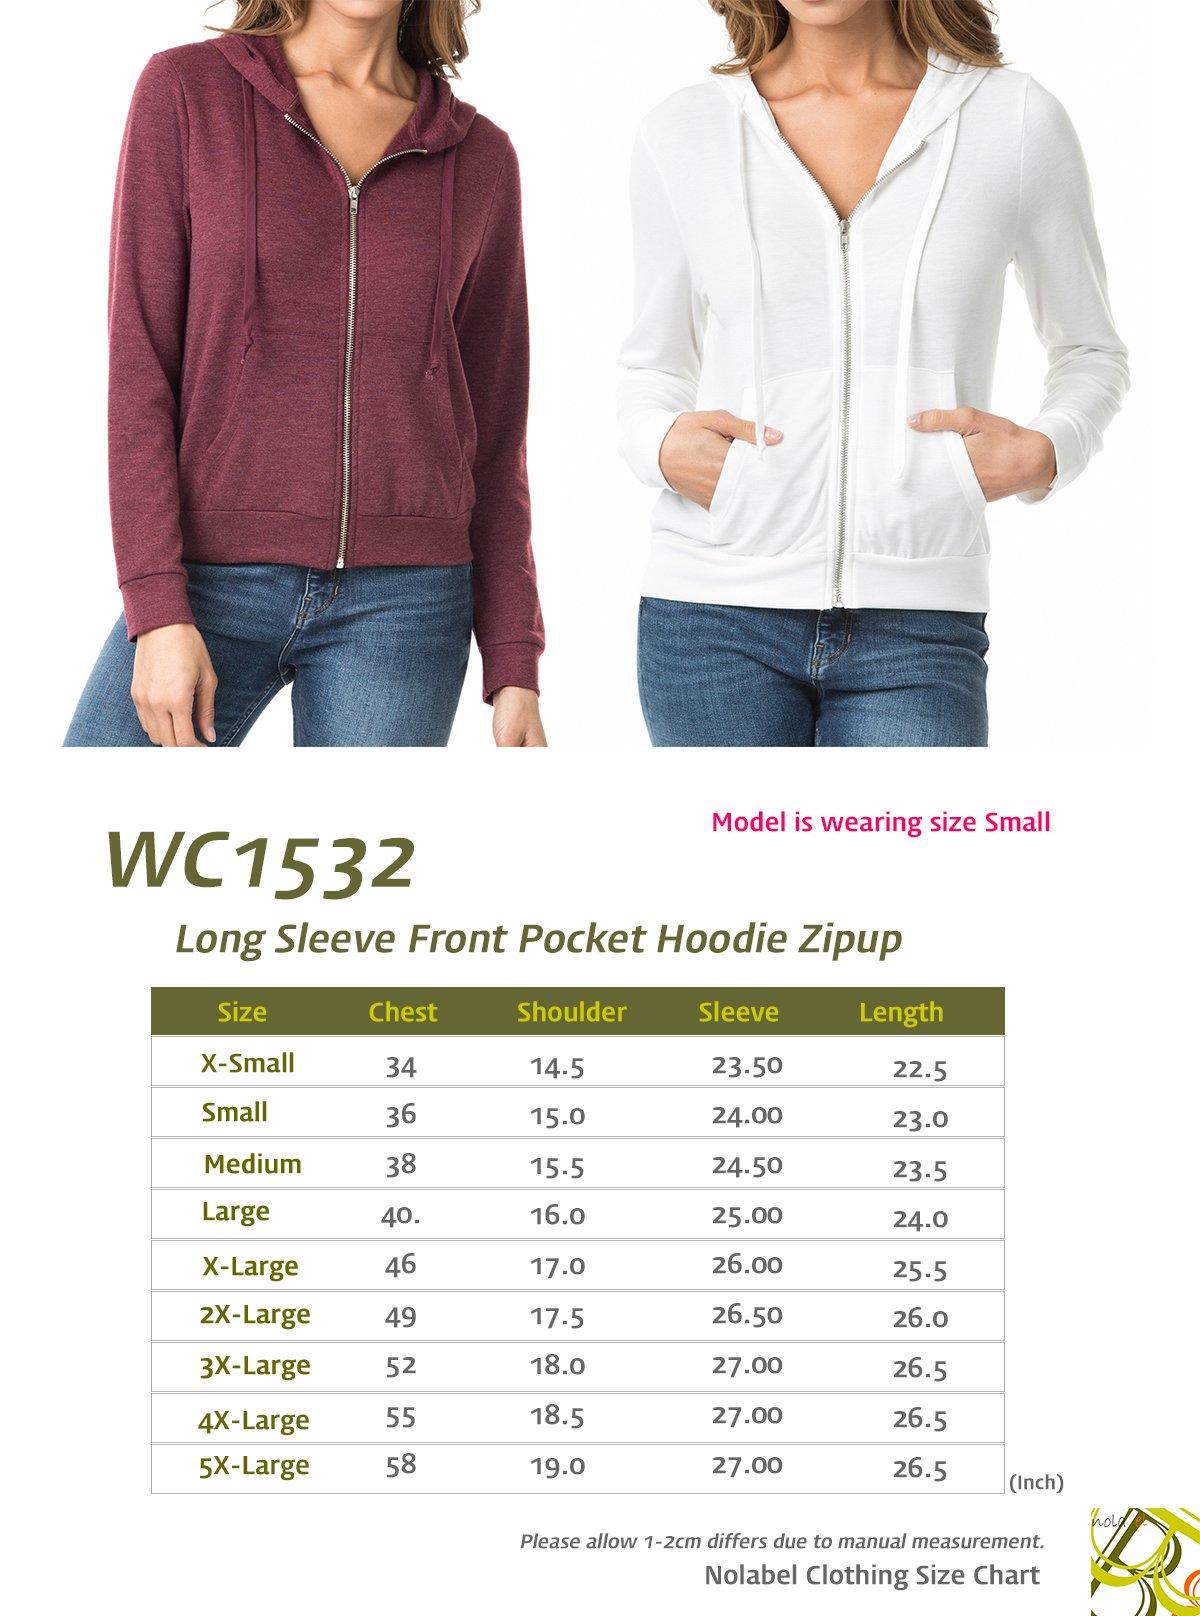 Nolabel B7_032 Women's Long Sleeve French Terry Drawstring Hoodies Zip Up Sweatshirt Hooded (Burgundy/5XL) by Nolabel (Image #6)